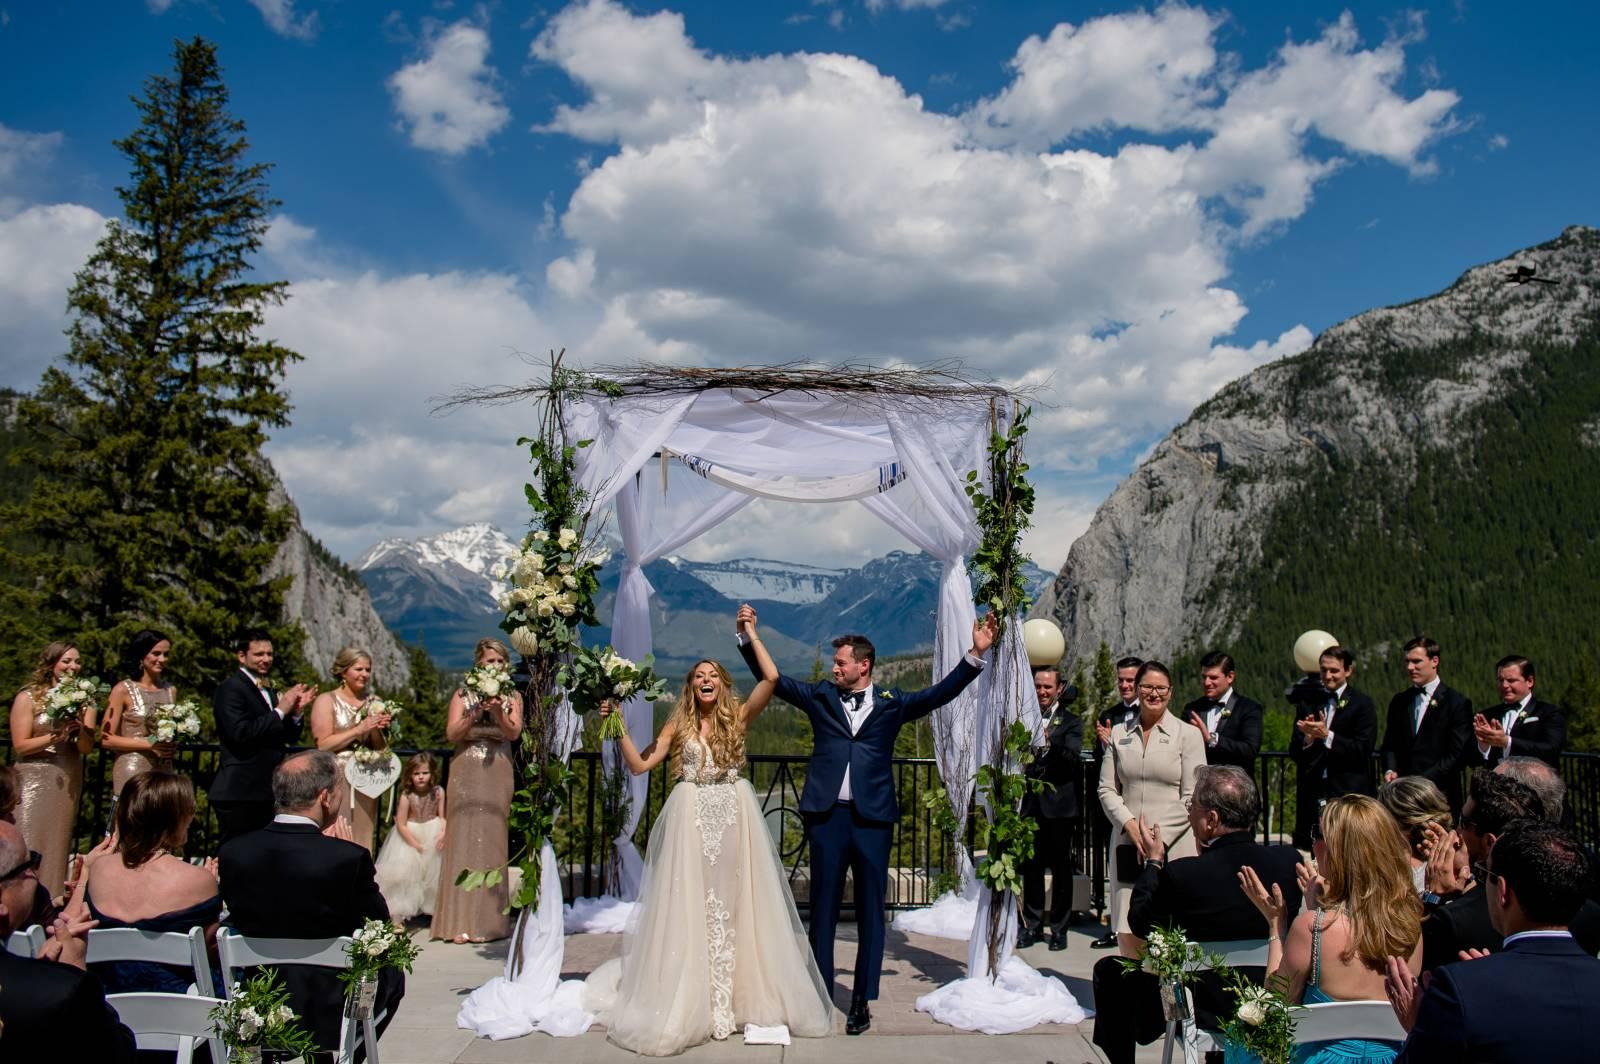 Fairmont Banff Springs Wedding Venue Weddings At The Castle In Rockies Item 6